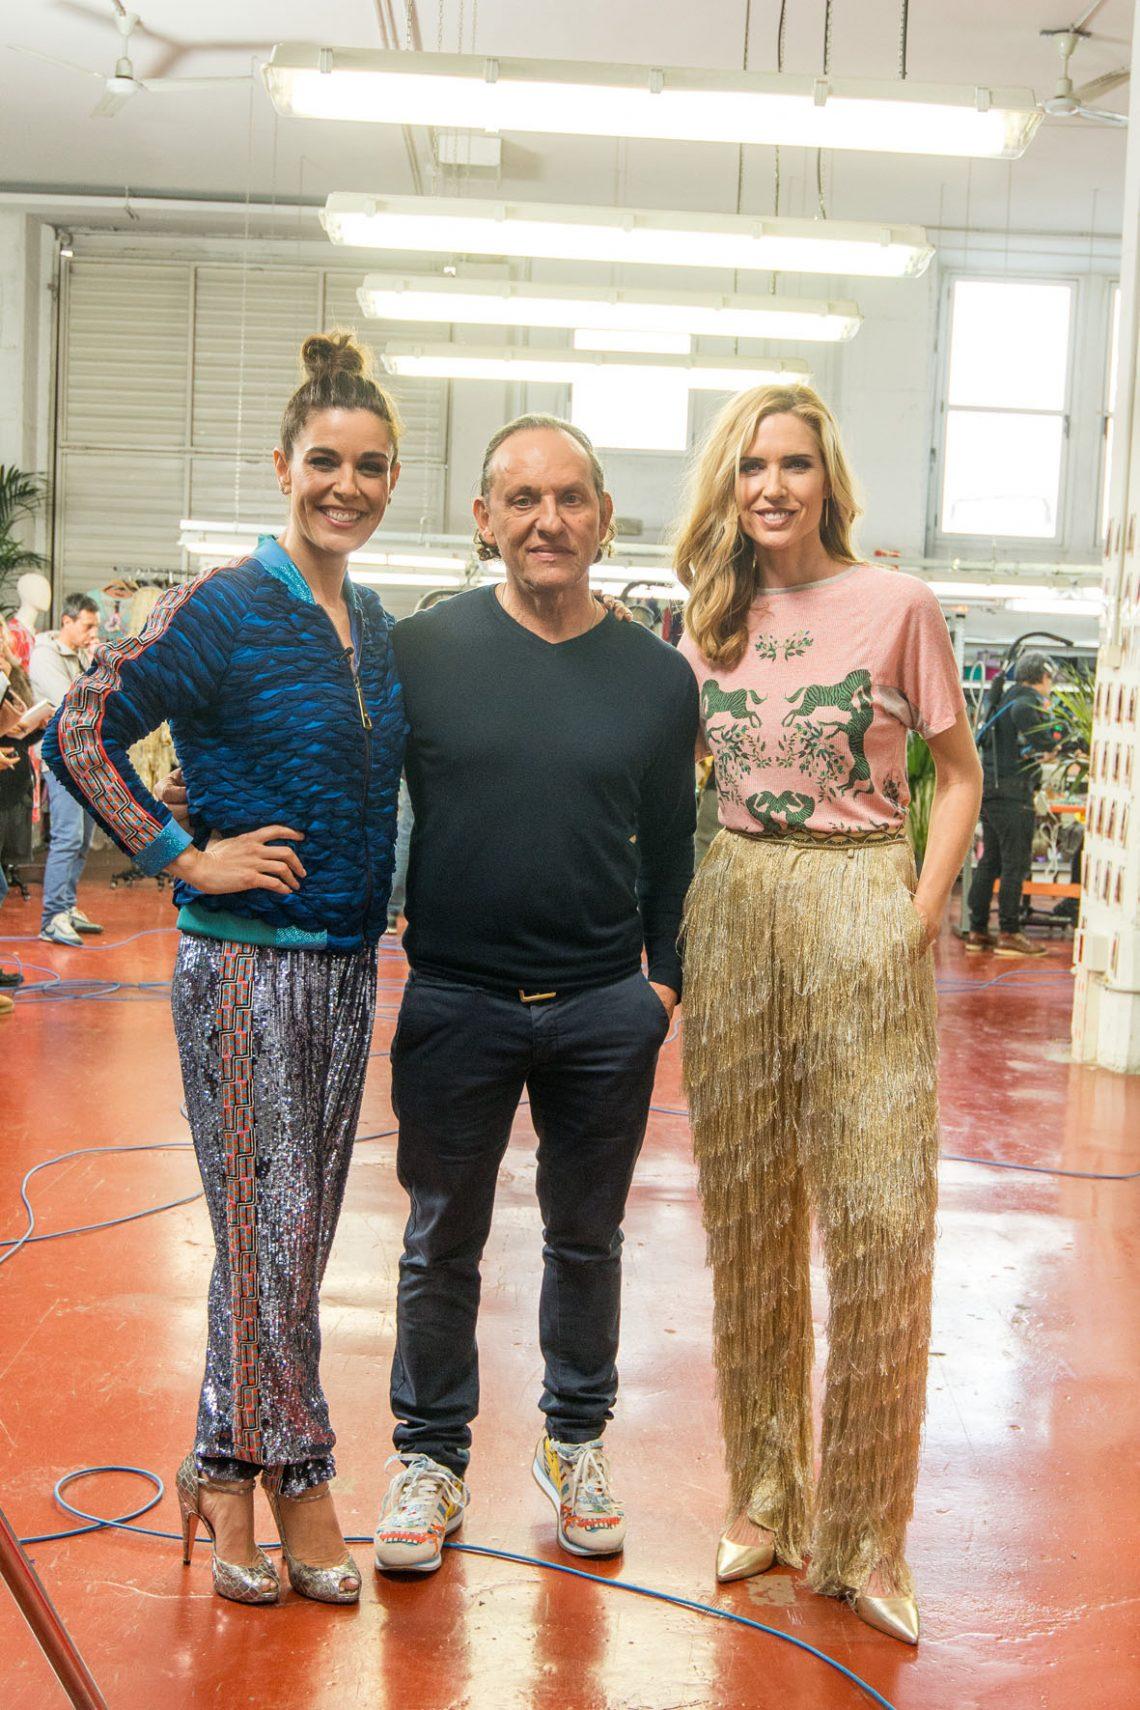 Jorge Vázquez, Custo, Ágatha Ruiz de la Prada o Judit Mascó pasarán hoy por 'Maestros de la Costura'